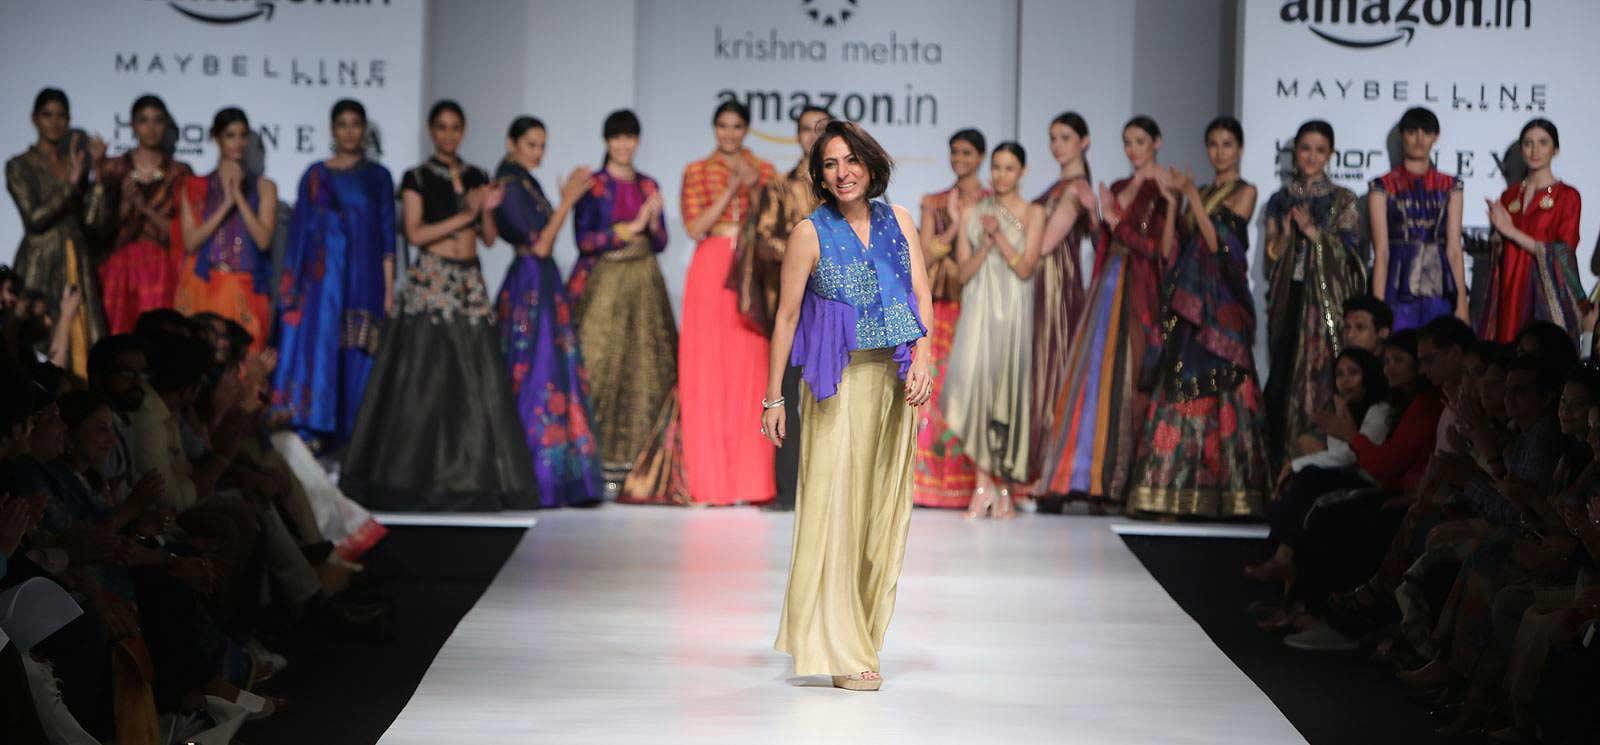 krishna-mehta-aifw-2017-fashion-show-dress-designer-indowestern-outfit-models-fashion